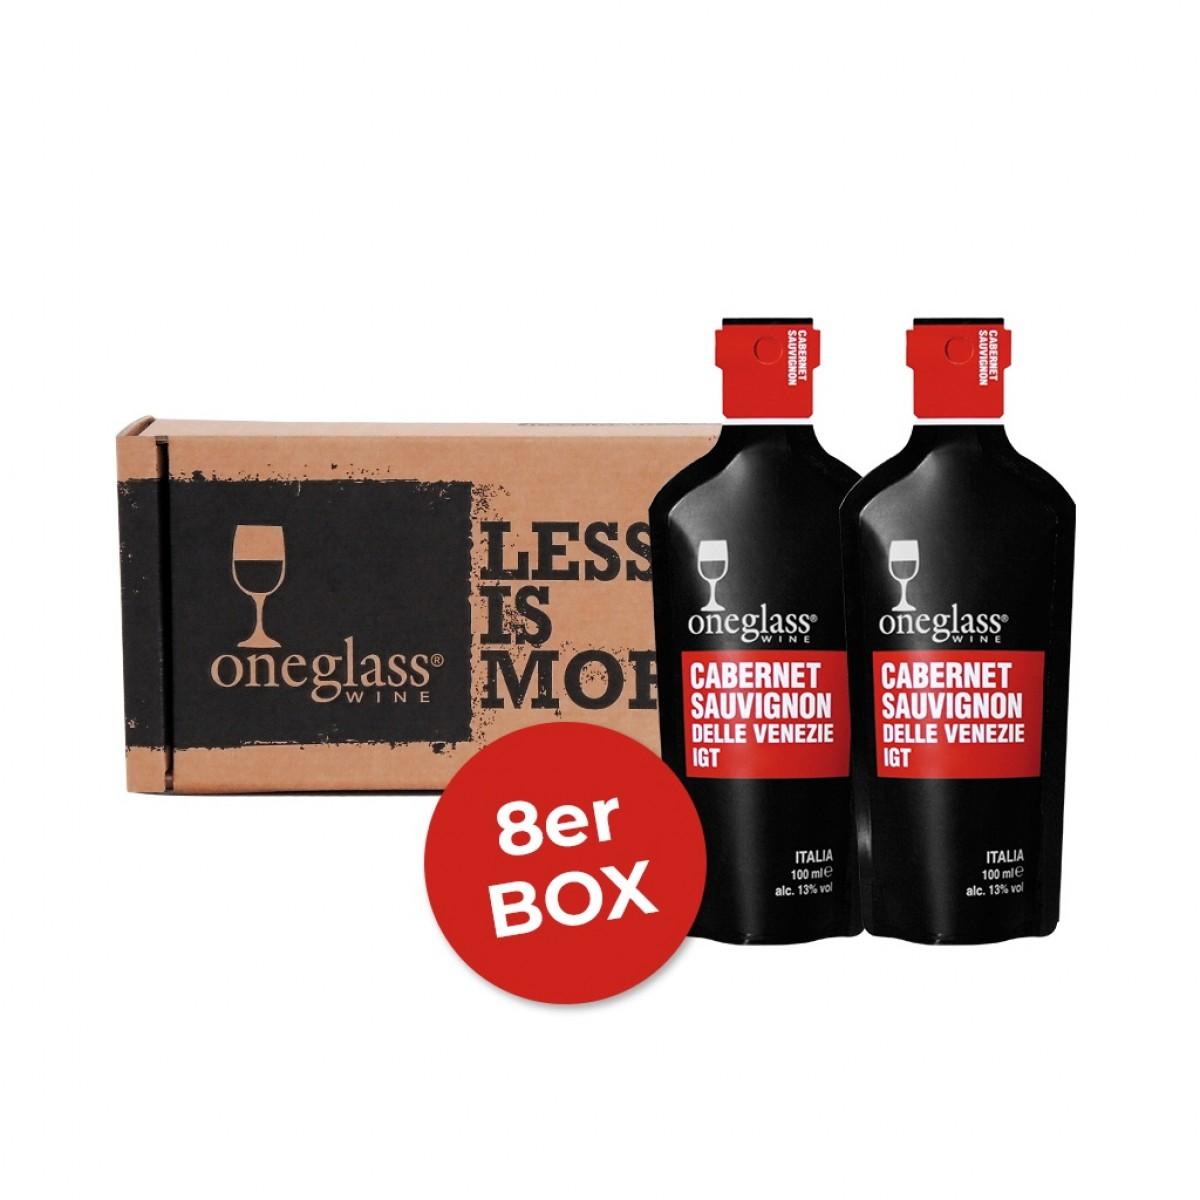 Cabernet Sauvignon Box ONEGLASS 100ml